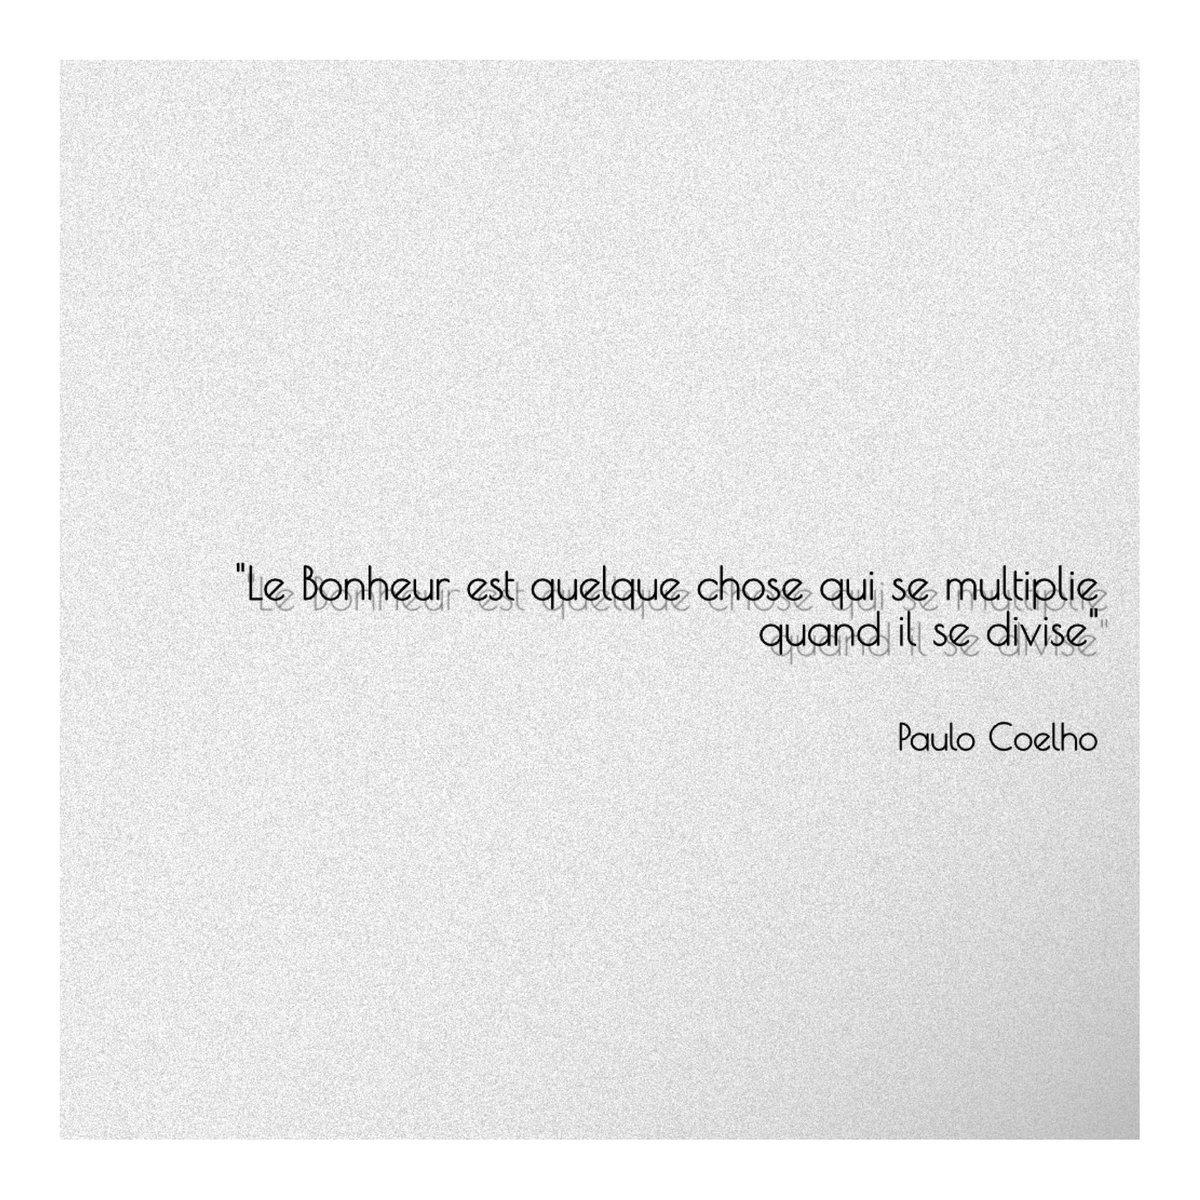 Sunday Mood • • • #citation #citations #paulocoelho #sundaymood #humeurdujour #mantra #mantras #bonheurs #joie #amitié #dimanche #sundaypost #postdujour #citationdujour #zenattitude #frienship #vie #vraivie #mot #motsdamour #joy<br>http://pic.twitter.com/oUHtMOmSBs